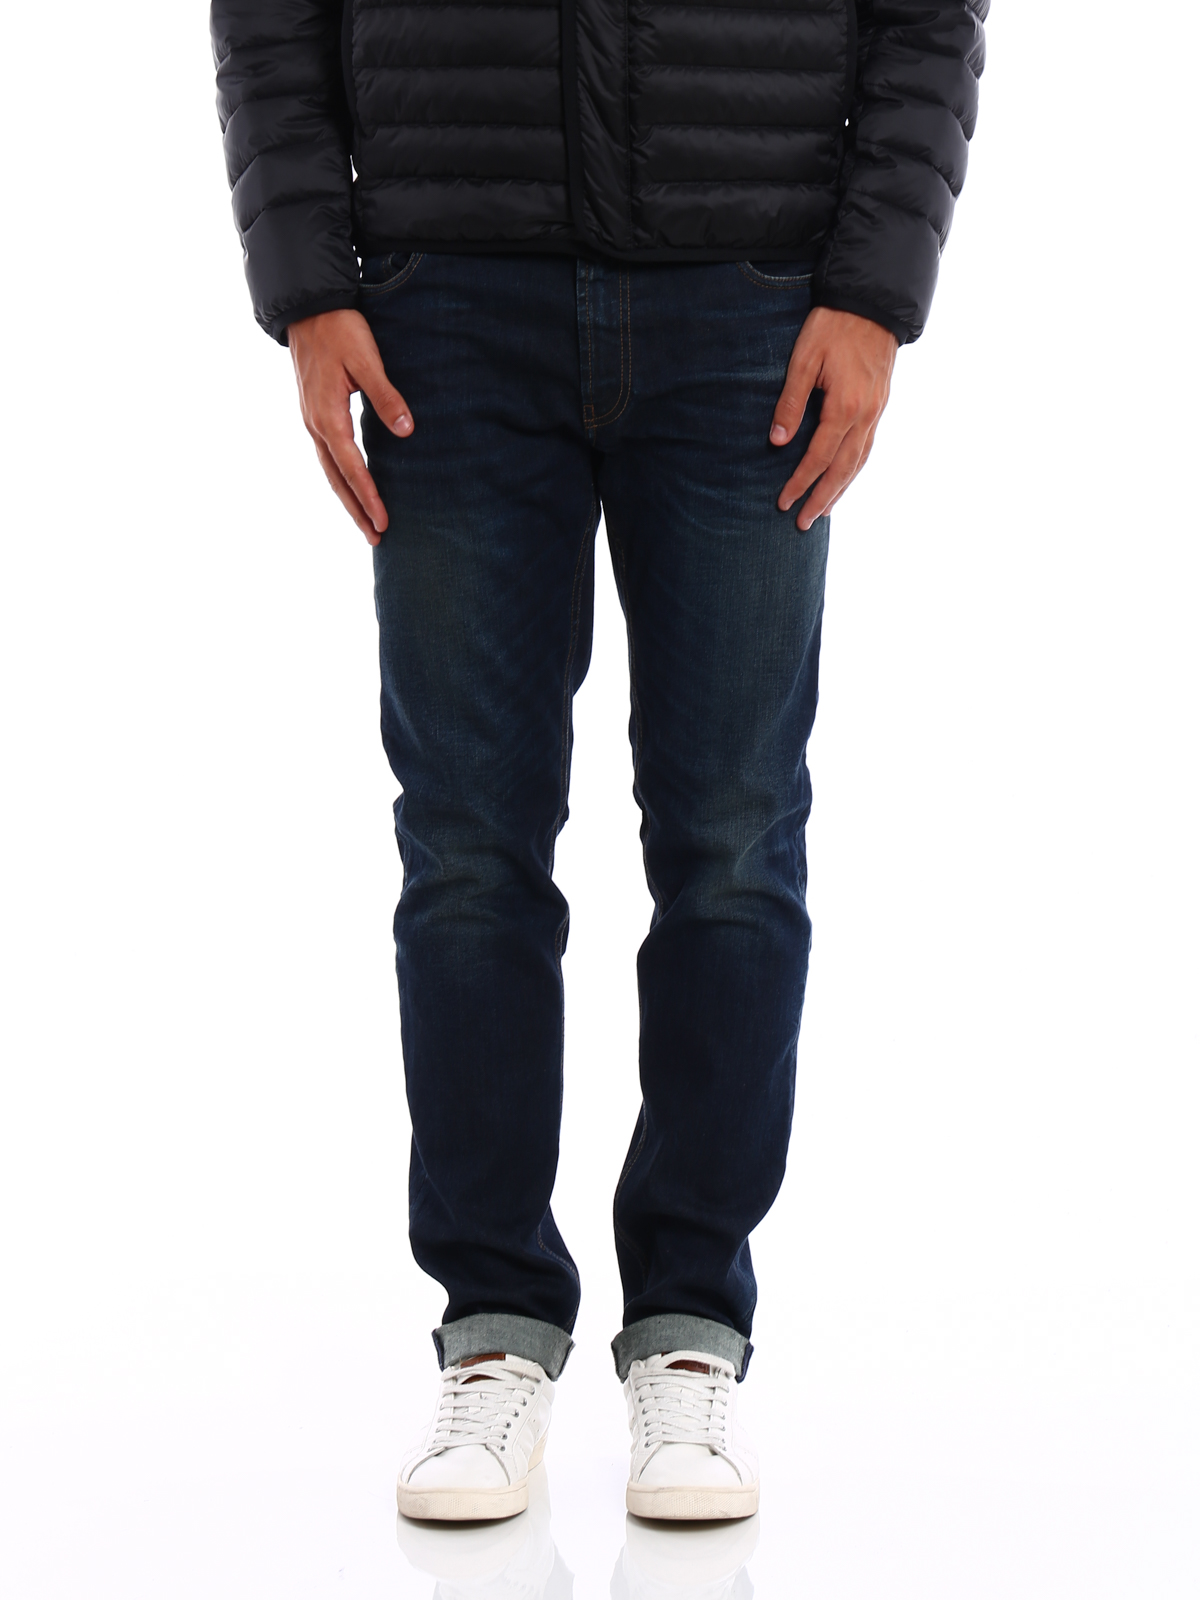 d985fb686e54d Prada - Straight Leg Jeans - Dark Wash - Straight Leg Jeans - GEP083 ...